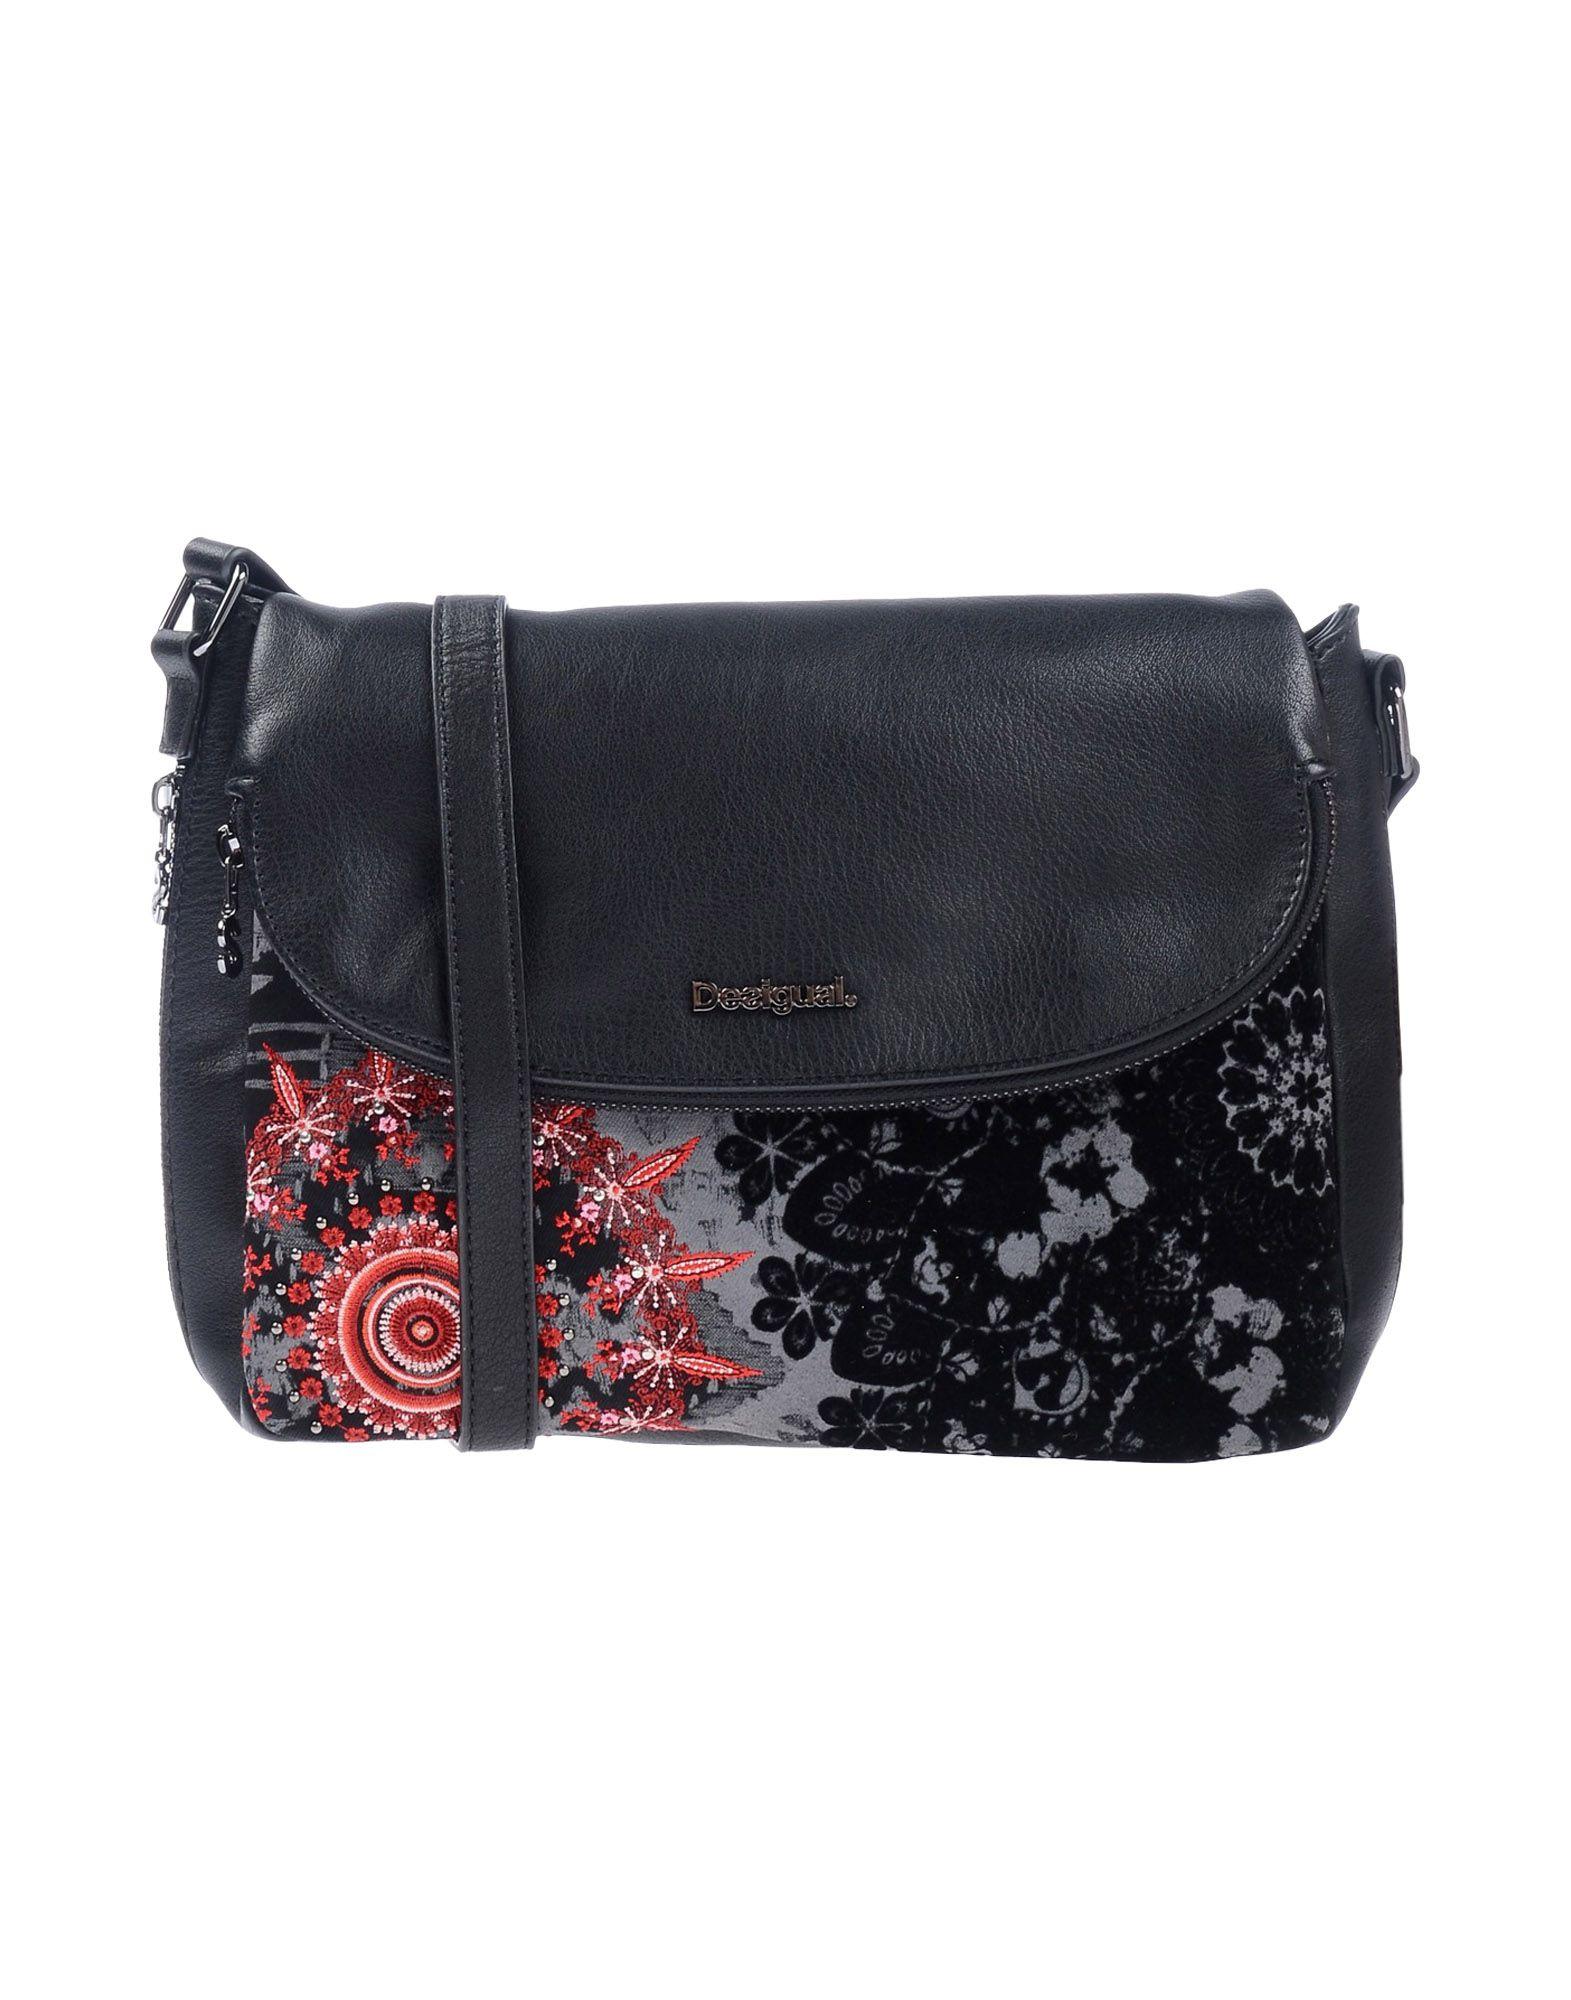 DESIGUAL Сумка через плечо сумка через плечо women handbag pu 2015 crossbody desigual hd0004